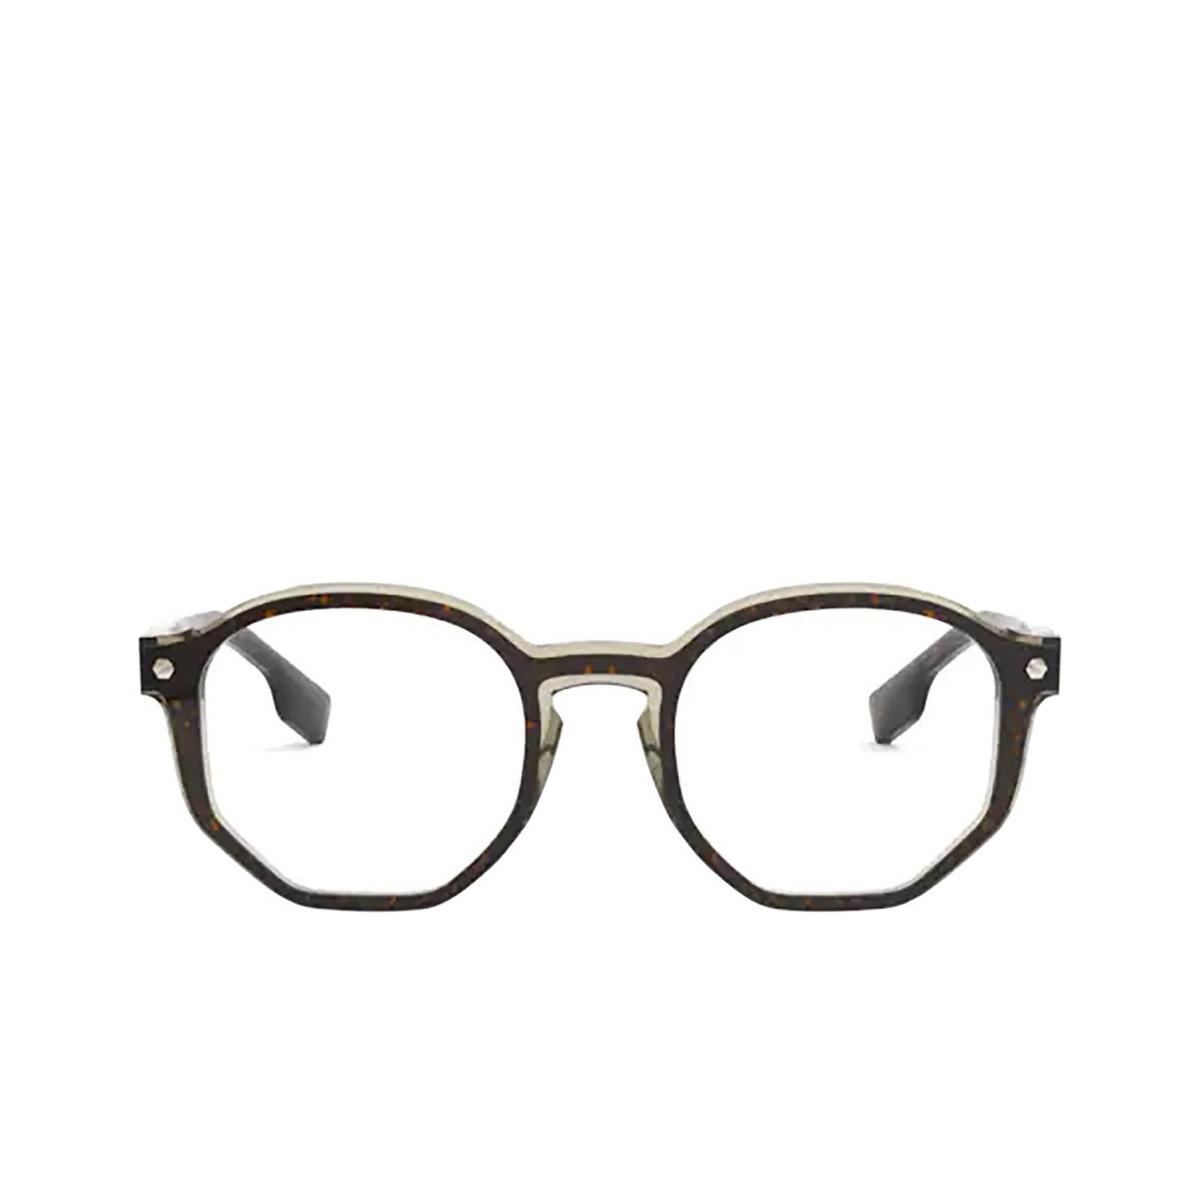 Burberry® Irregular Eyeglasses: Hogarth BE2317 color Top Havana On Grey Transparent 3660 - front view.